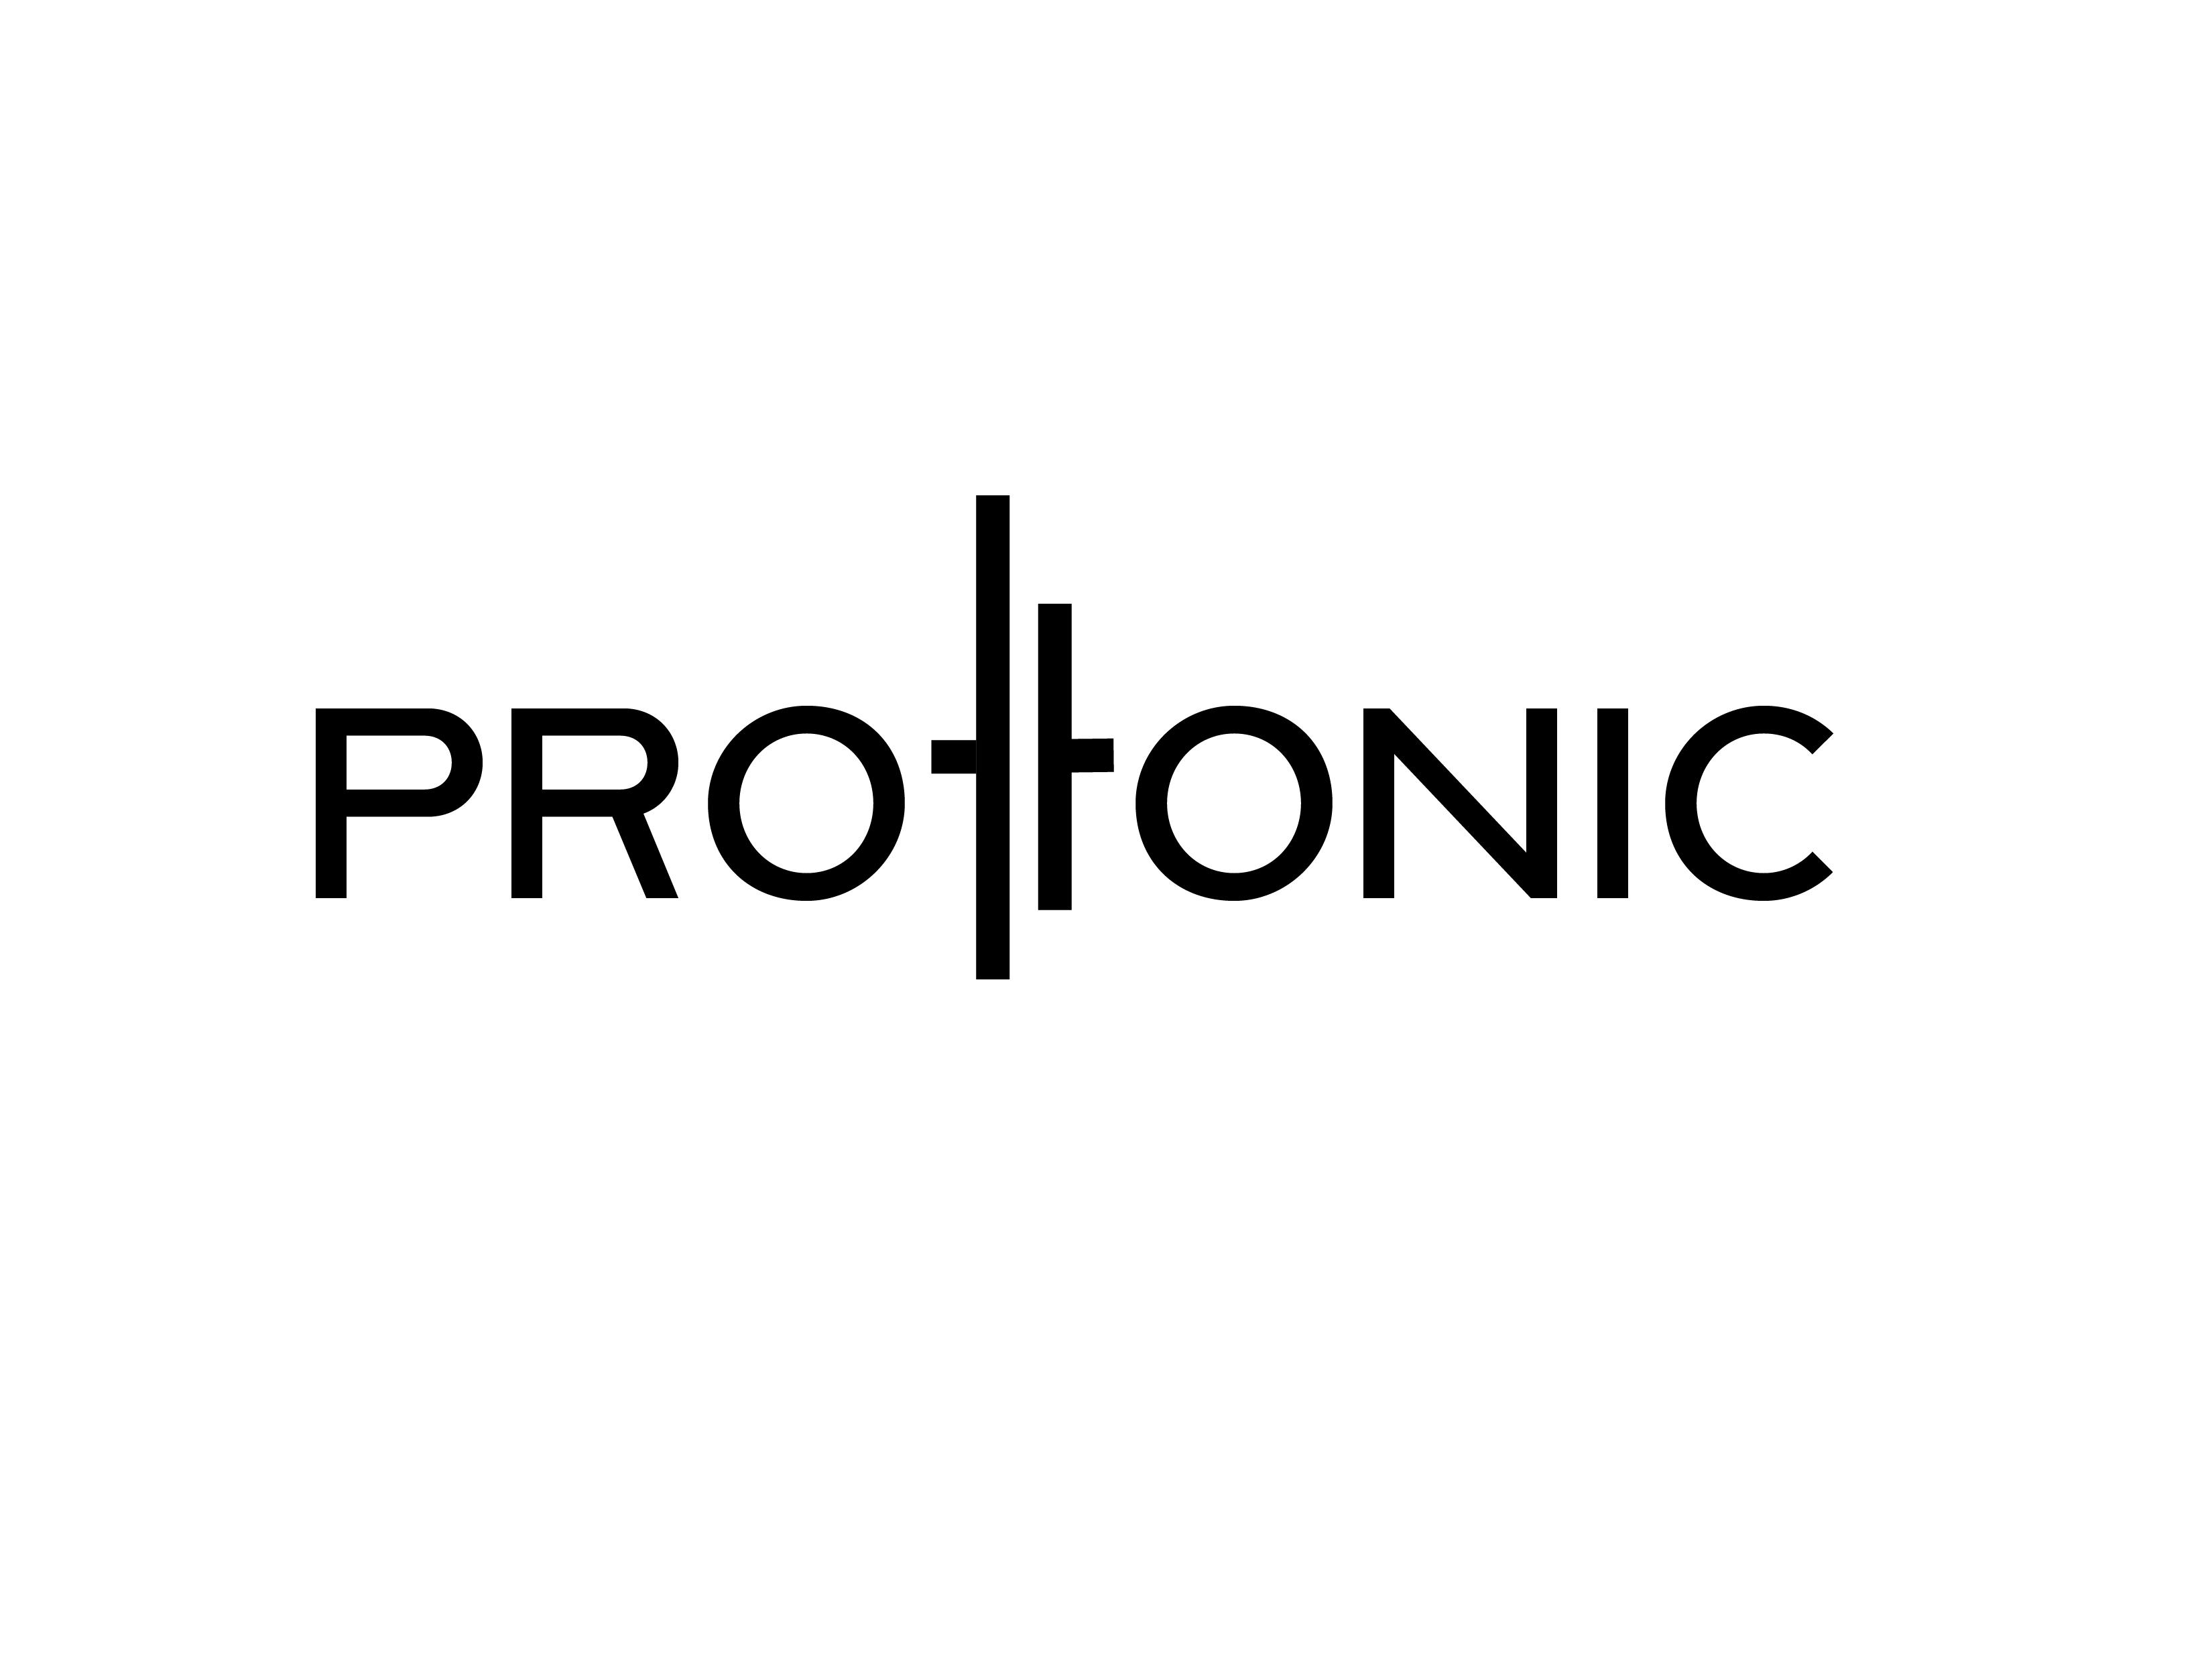 protonic 1 -assets-01